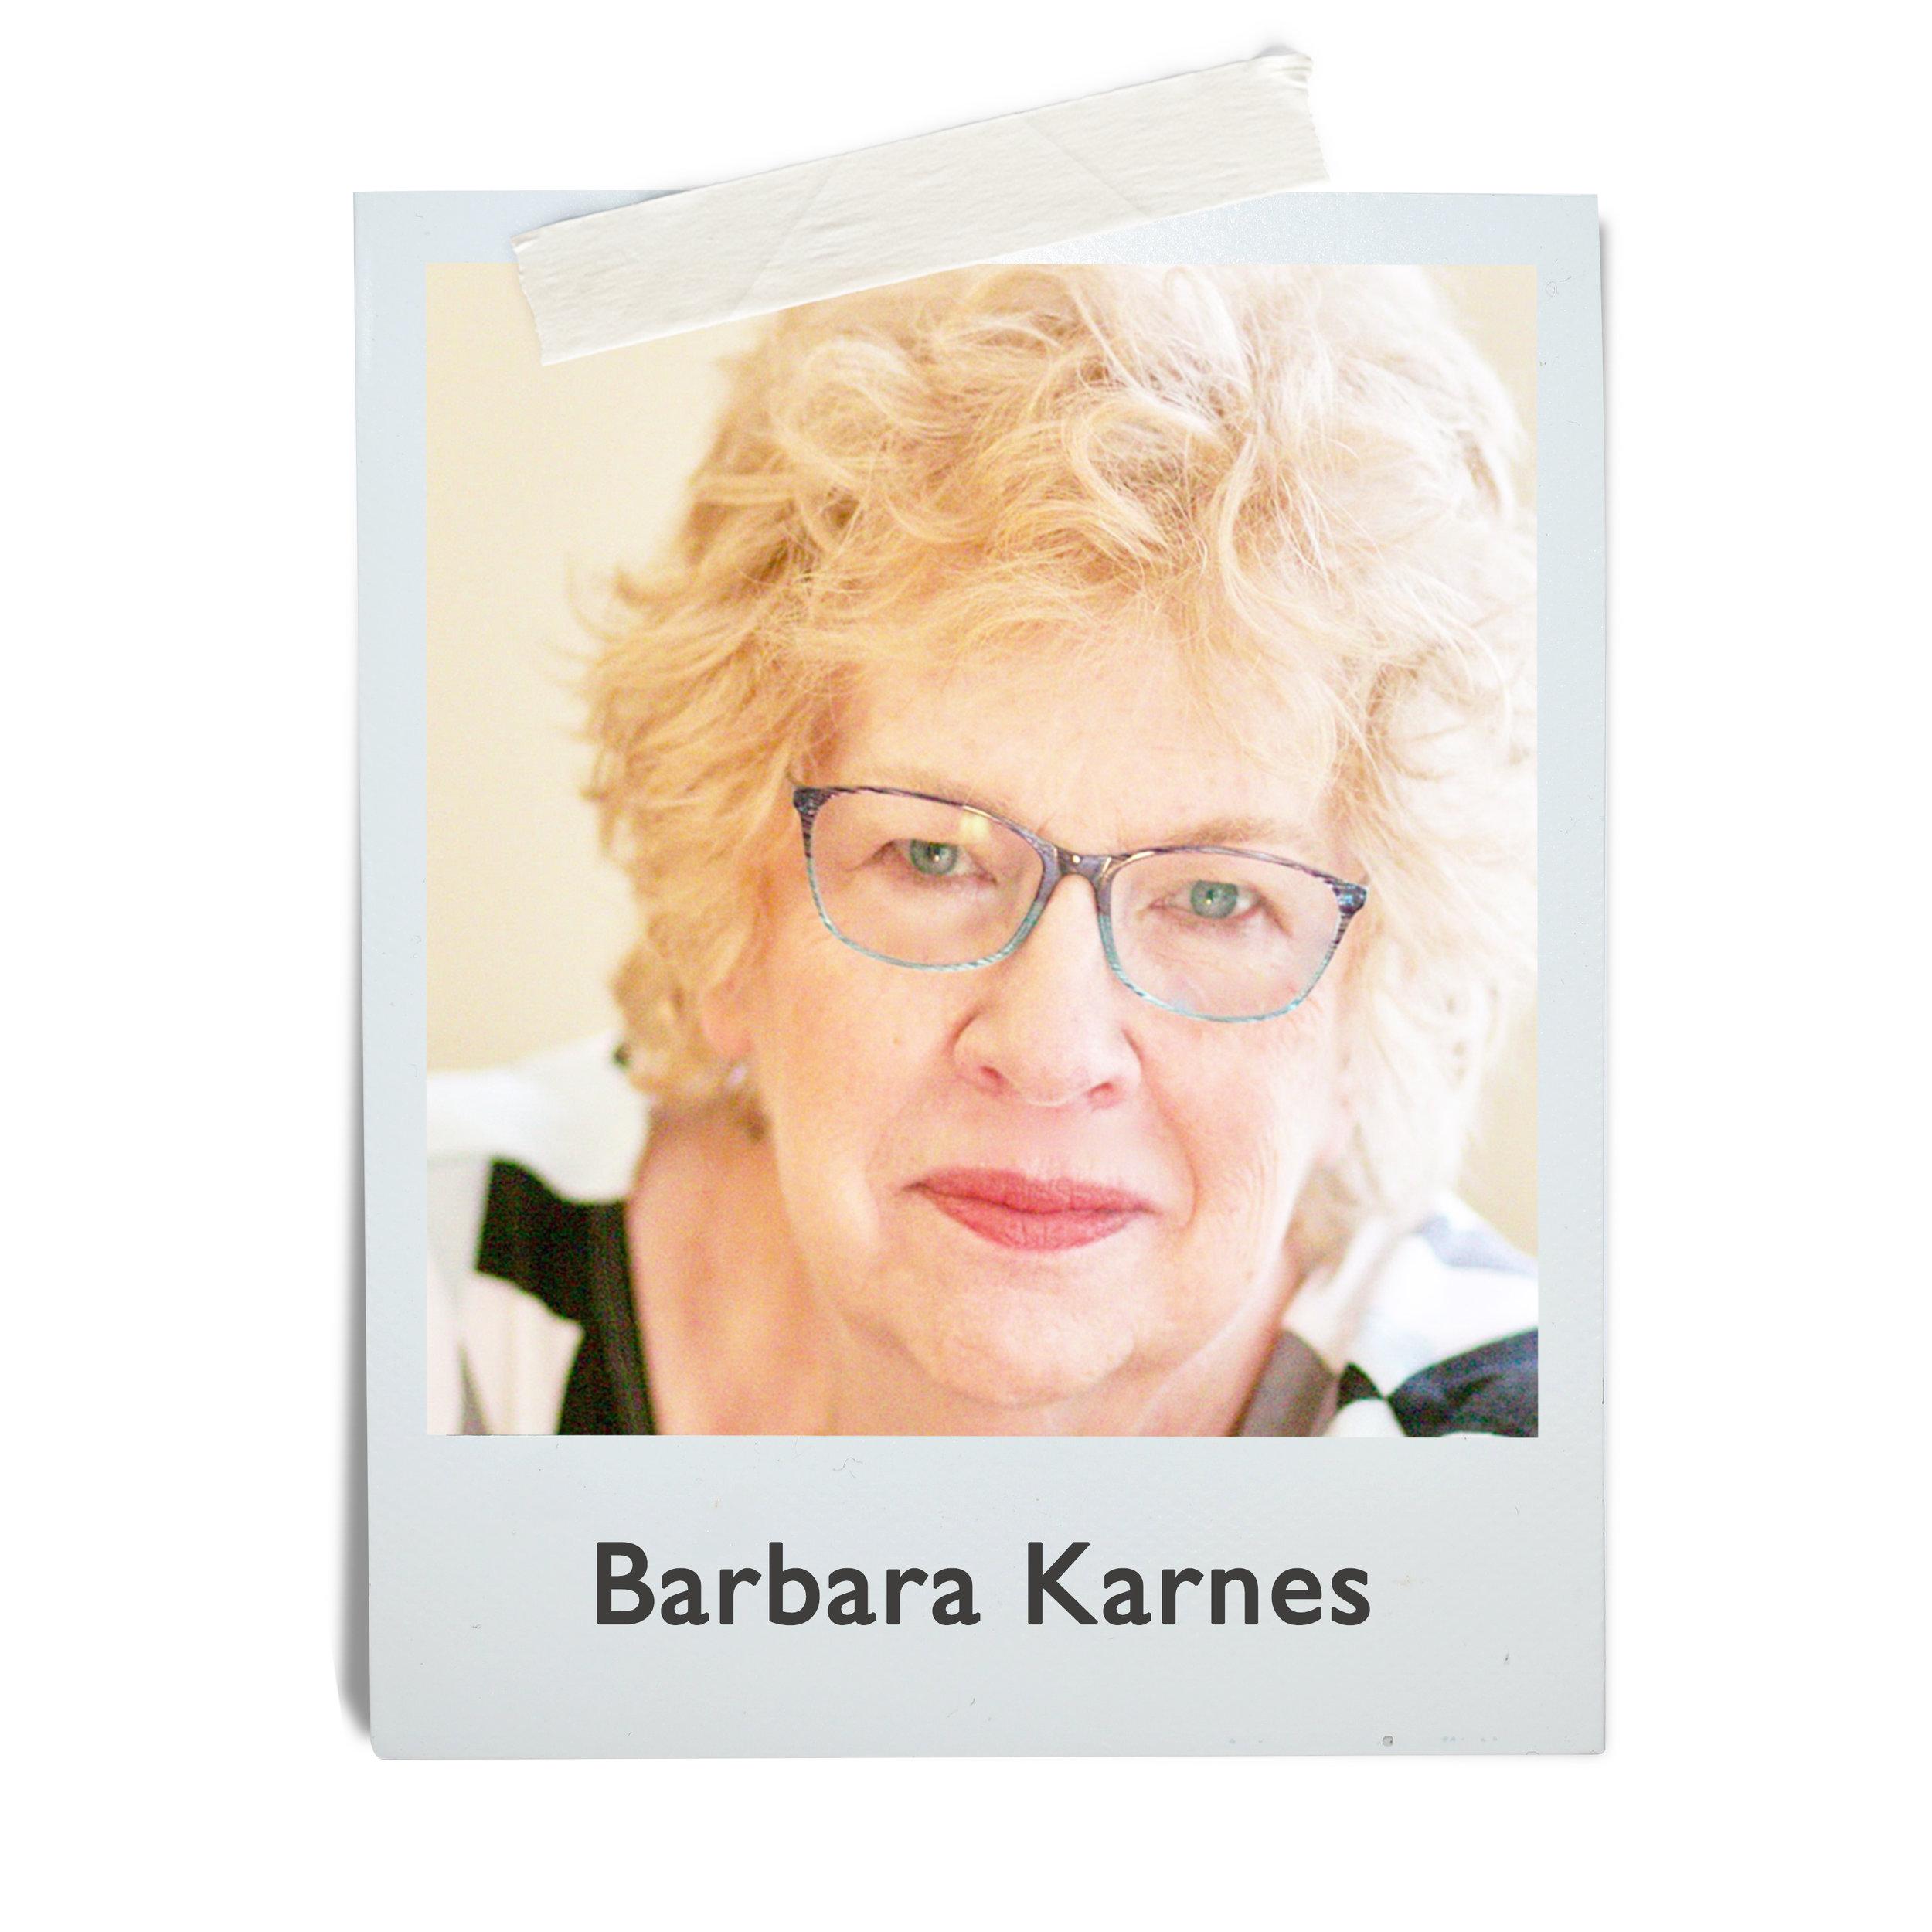 Barbara Karnes